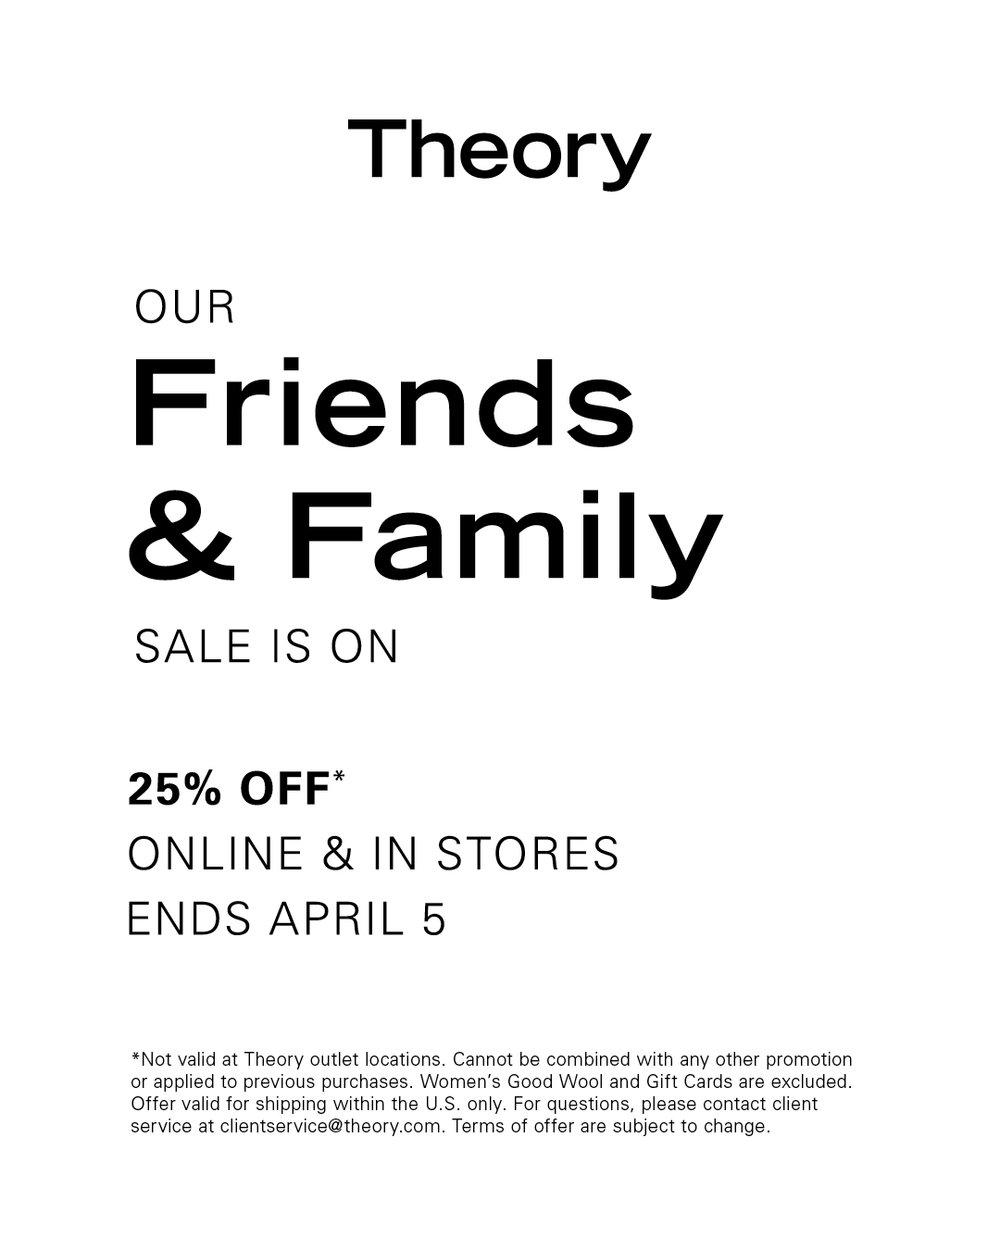 Theory_F+F_Sale_Retail_1080x1350 (1).jpg